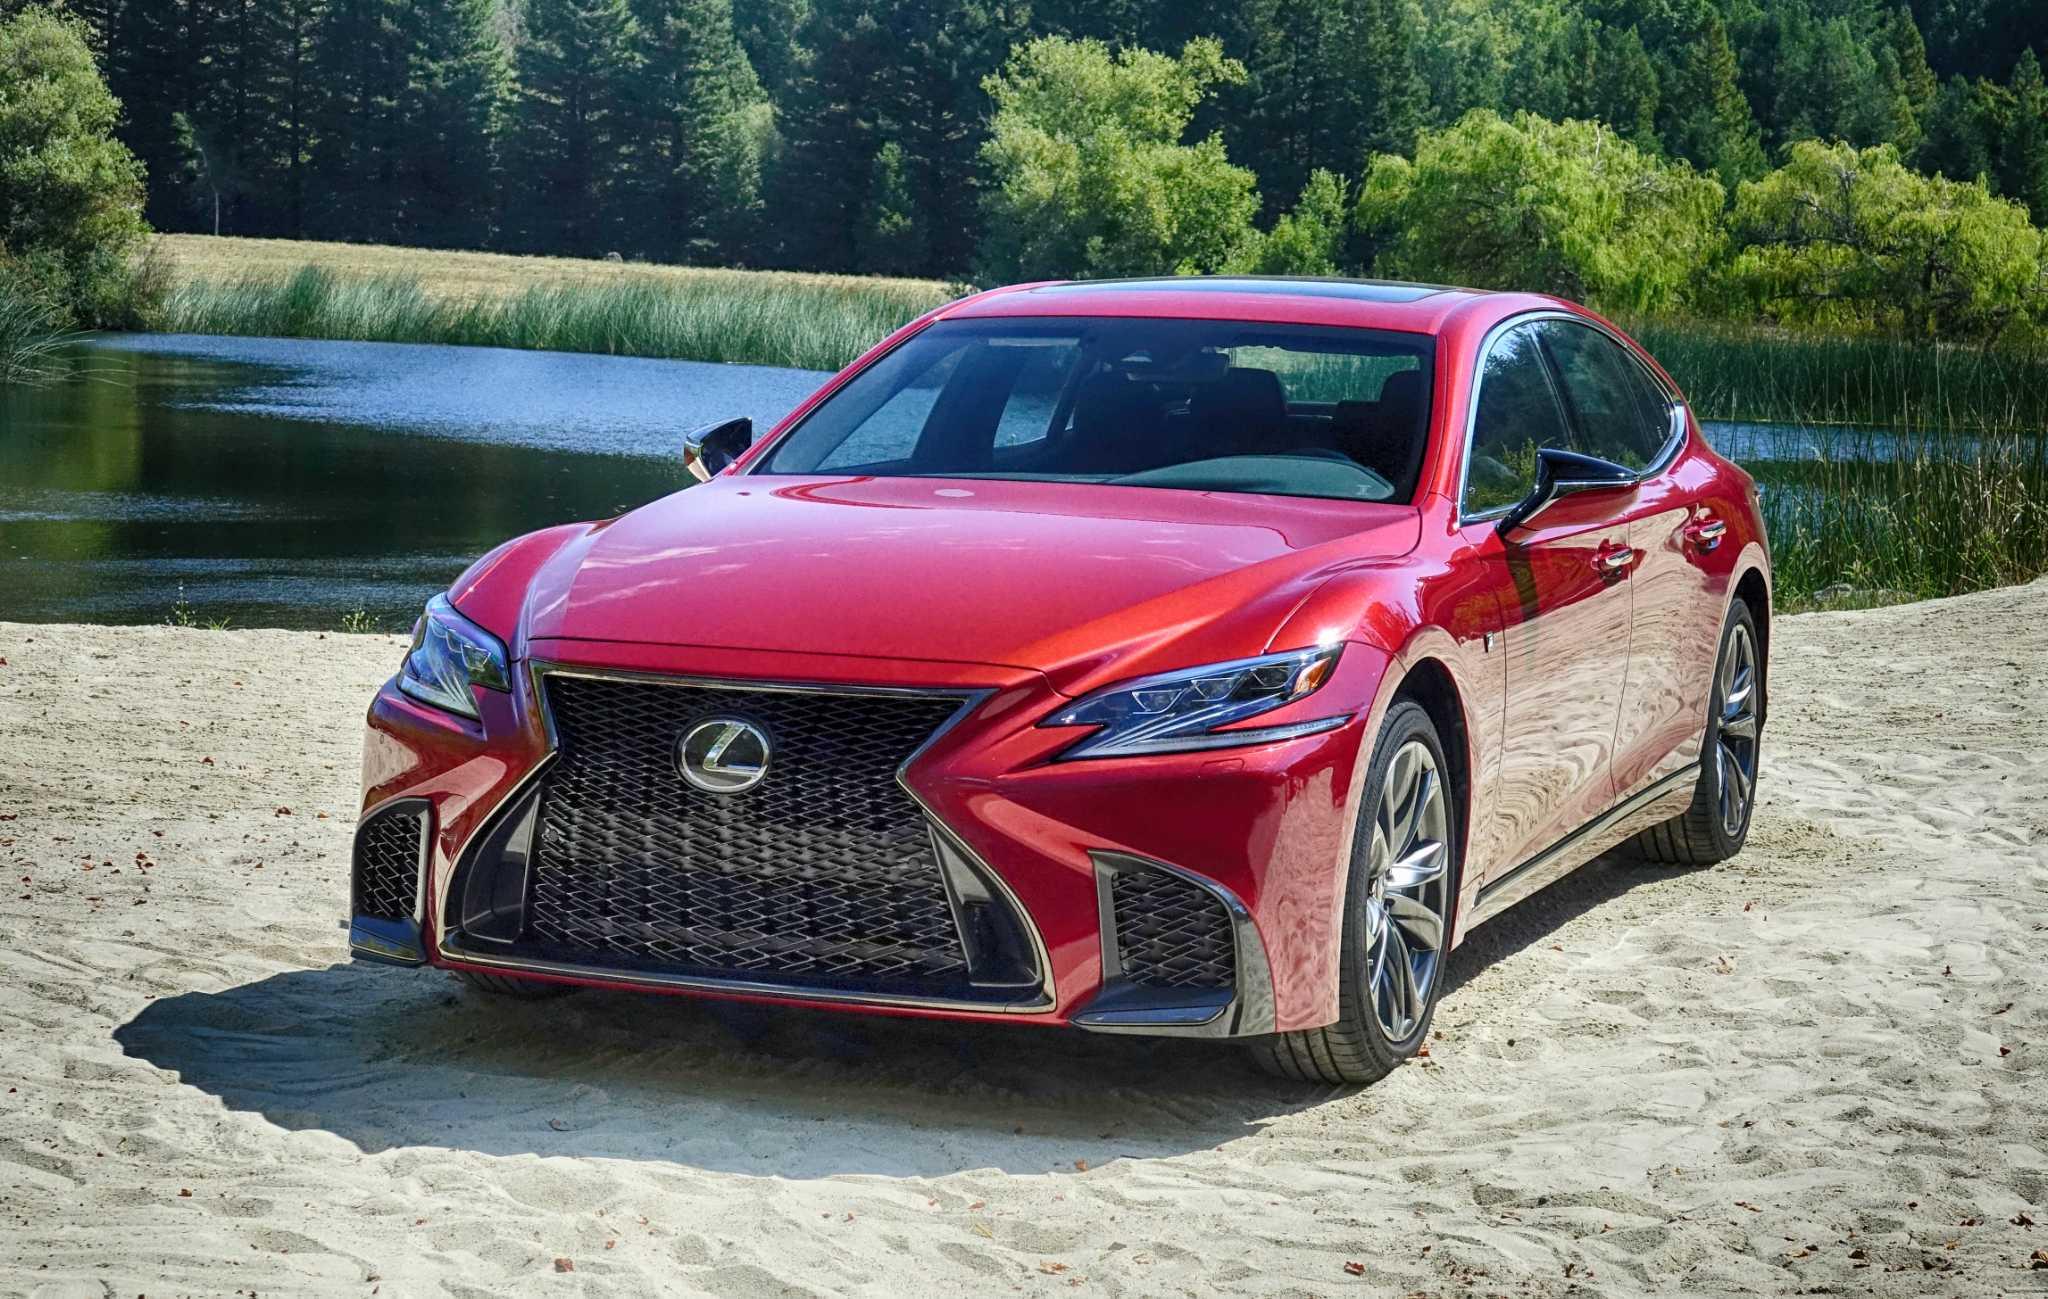 Massively overhauled 2018 Lexus LS is fast luxurious Houston